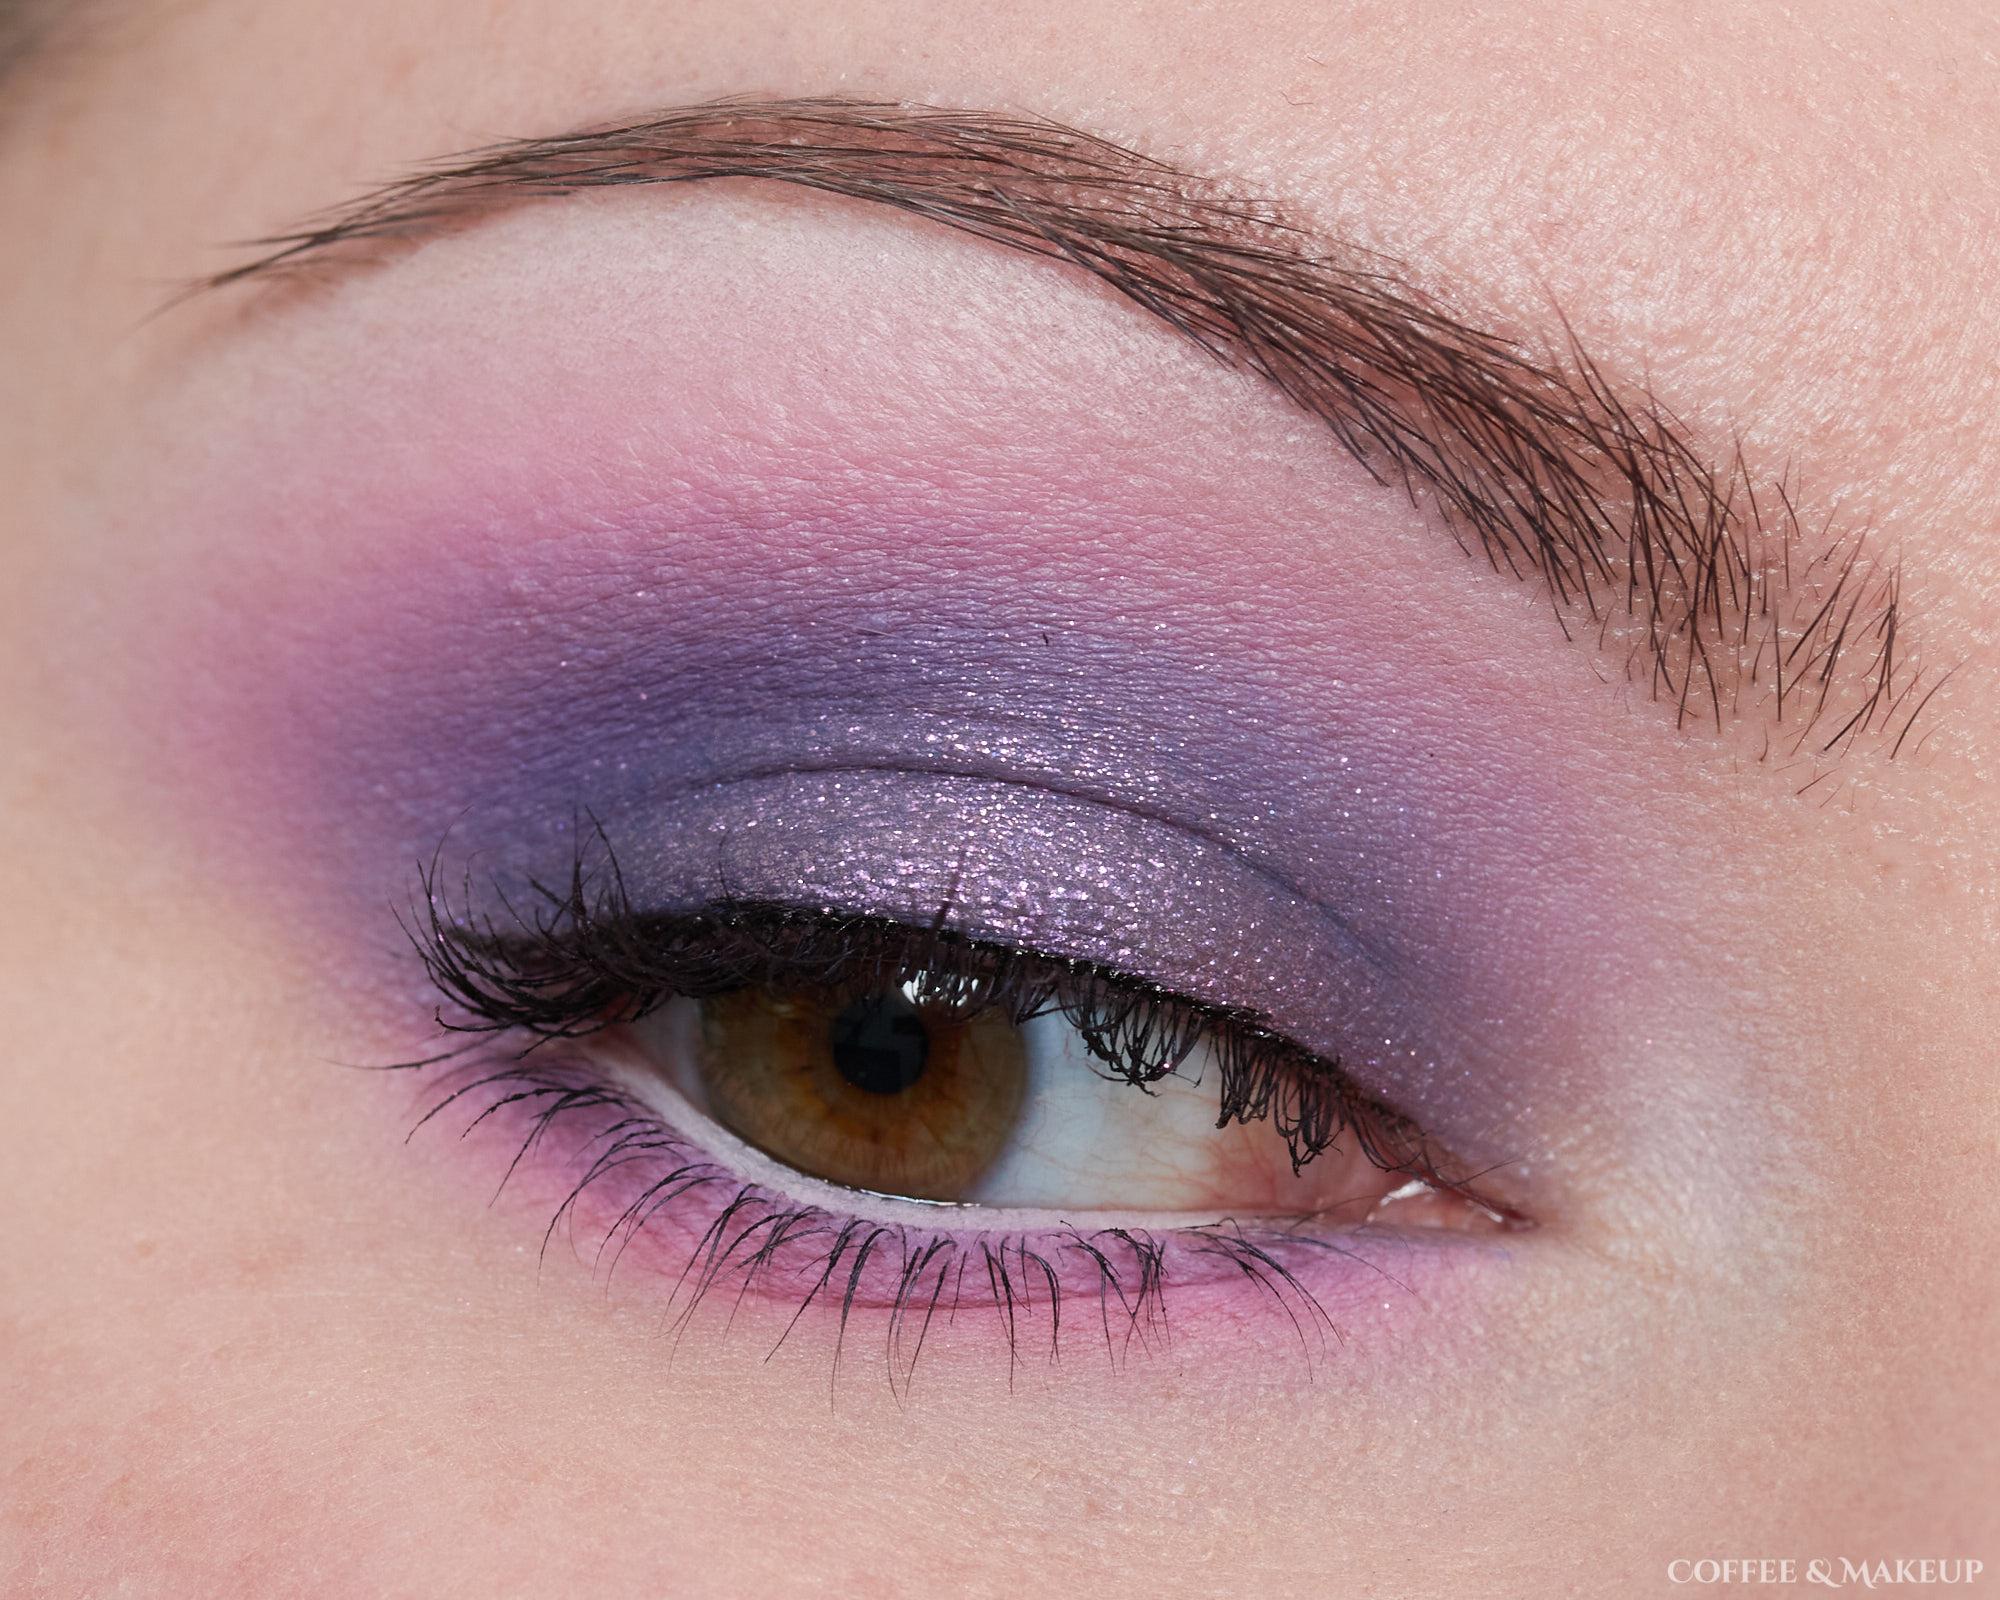 Menagerie Cosmetics Violet Ink Palette Look #2 (unedited)